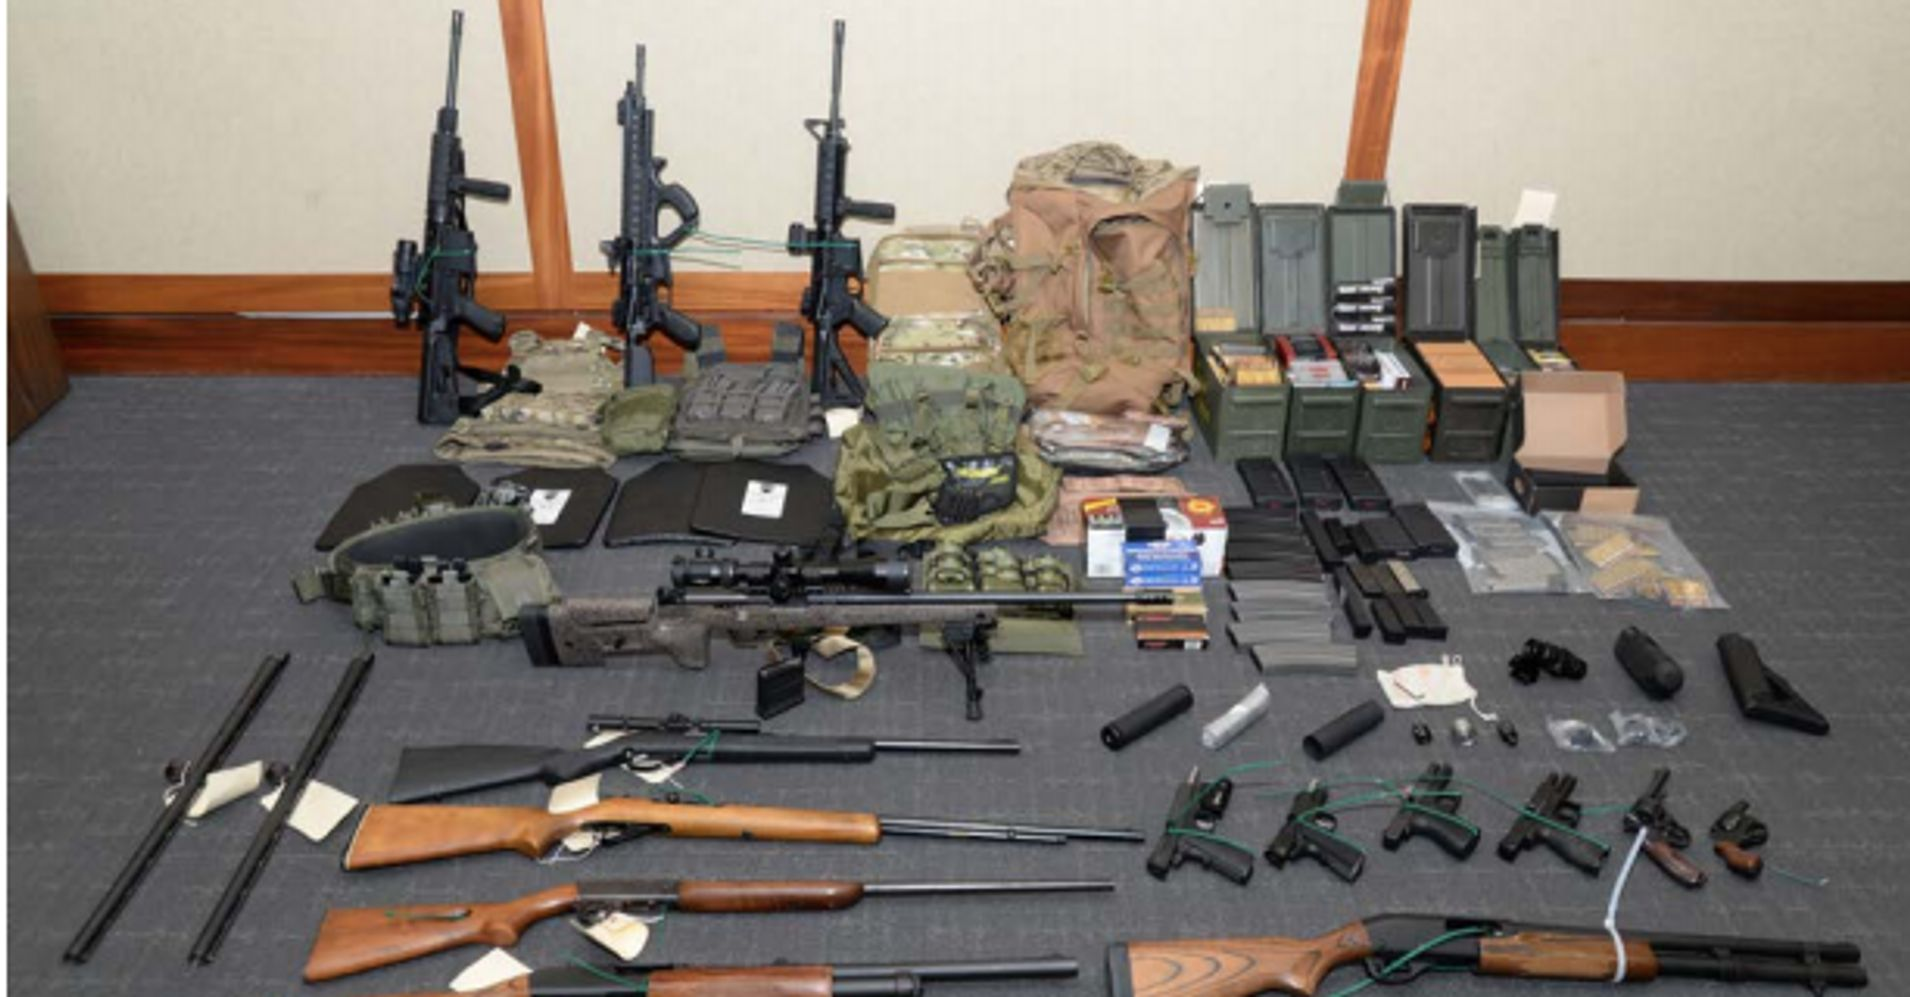 Feds: Racist 'Domestic Terrorist' Coast Guard Lieutenant Plotted To Kill Democrats, Reporters